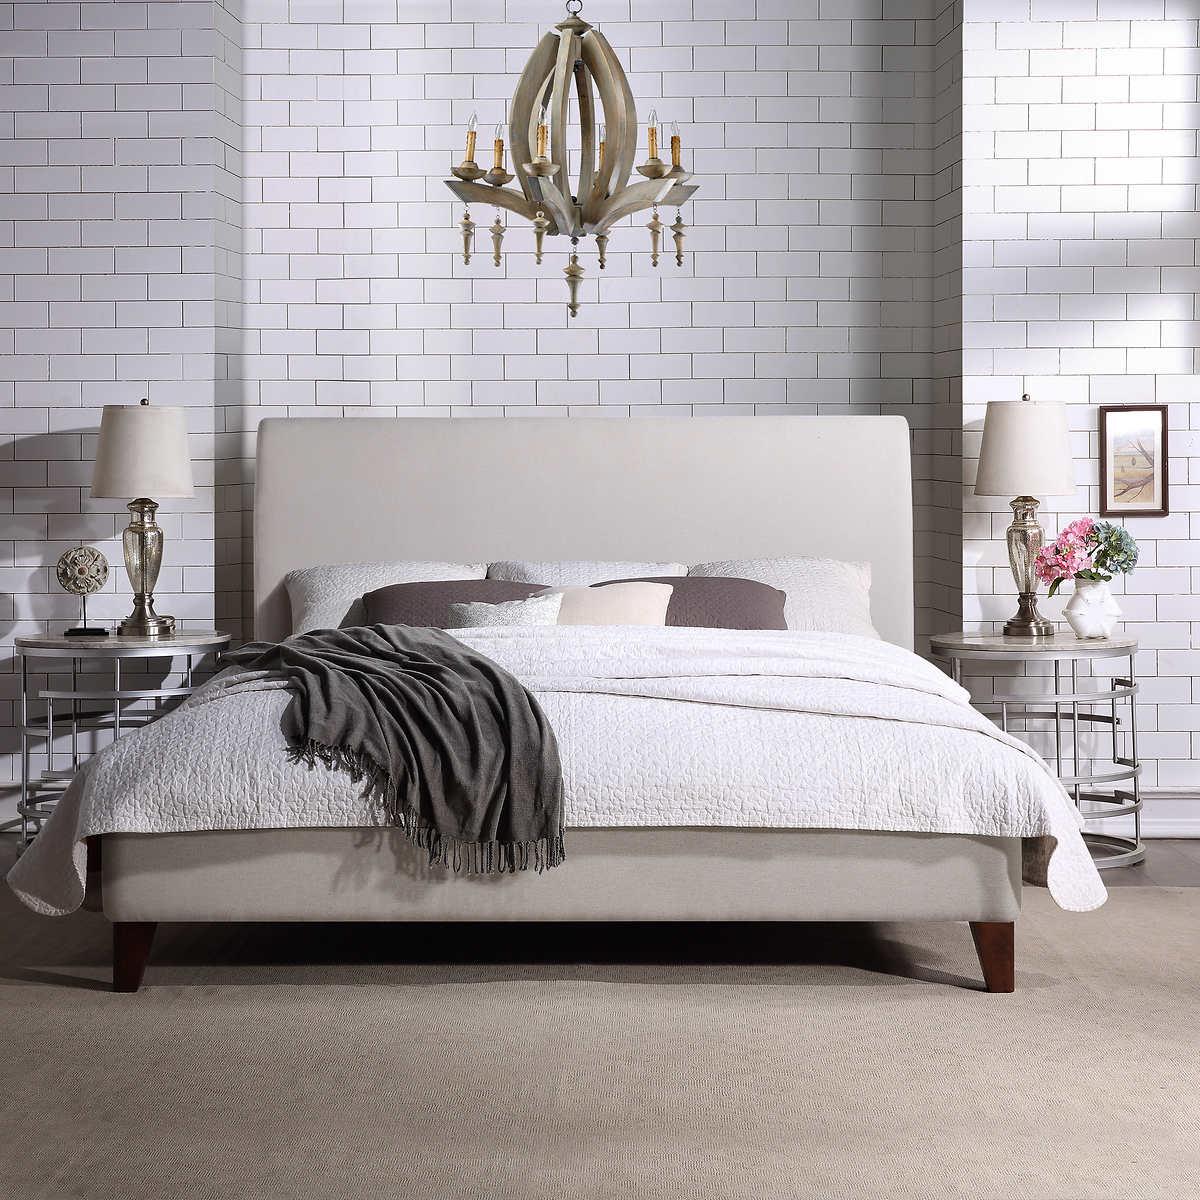 Build an Upholstered Bed Frame